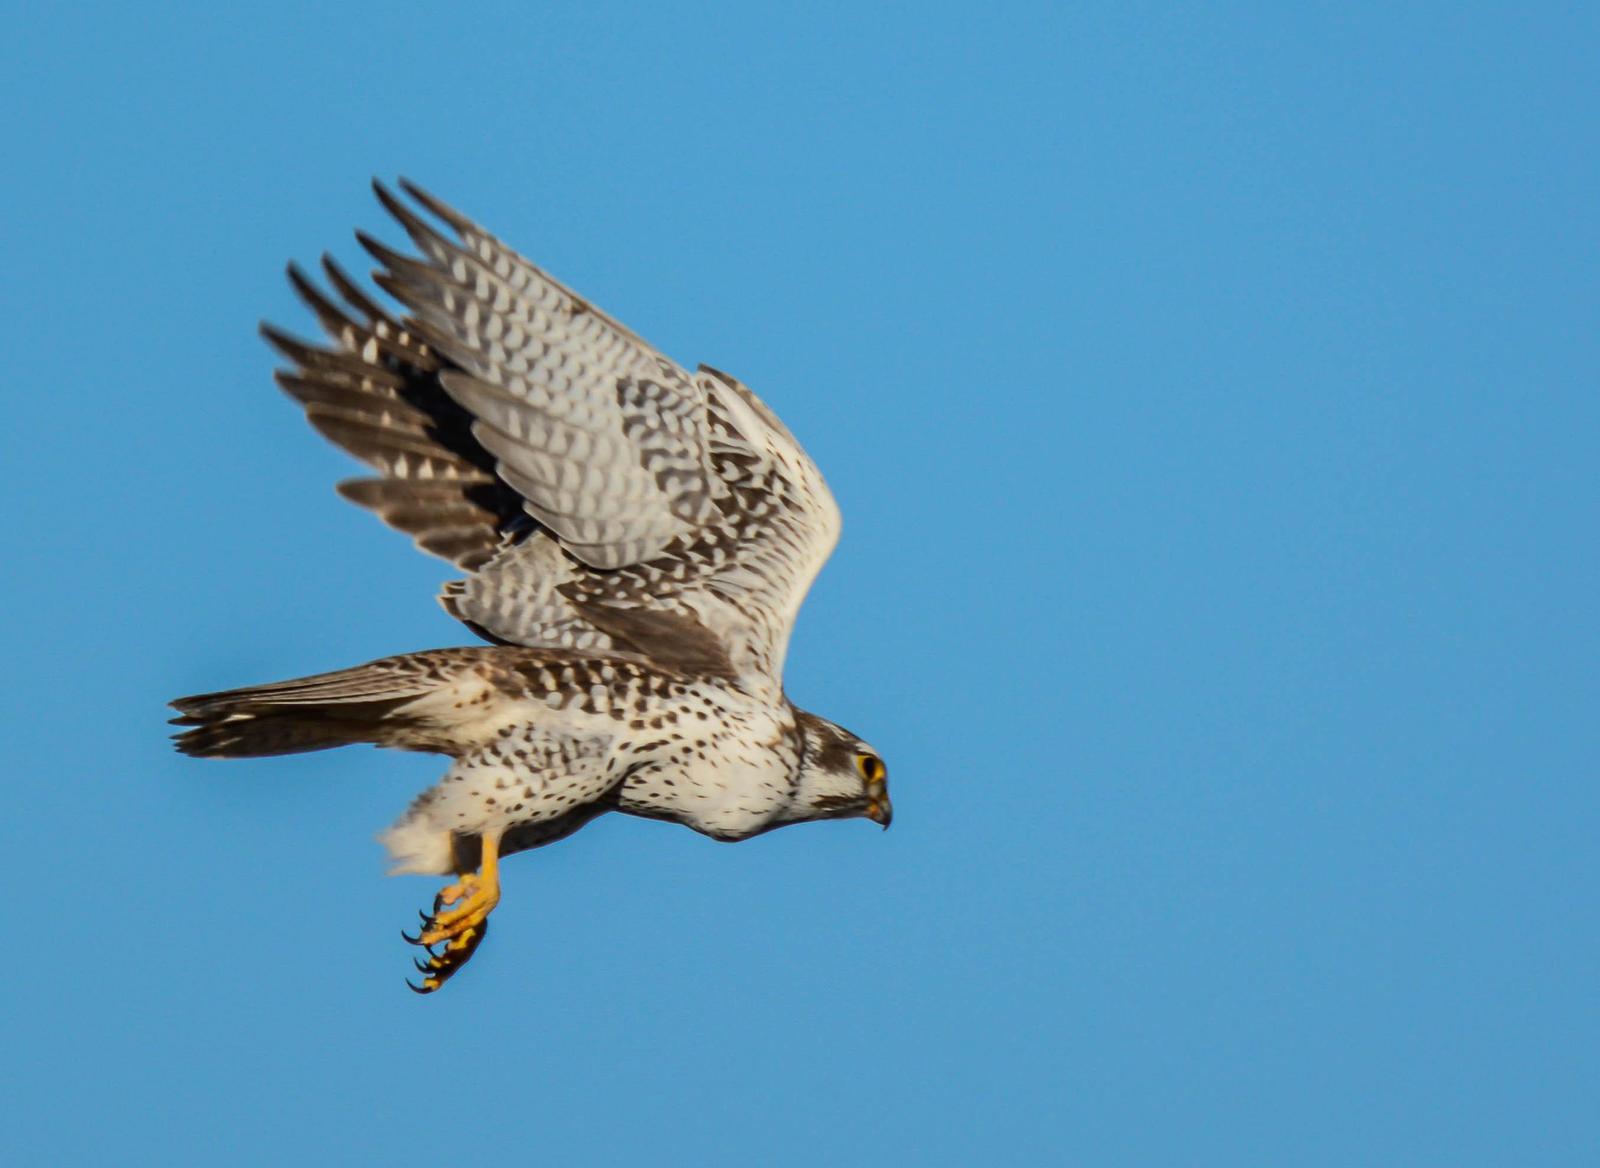 Prairie Falcon Photo by Karen Prisby